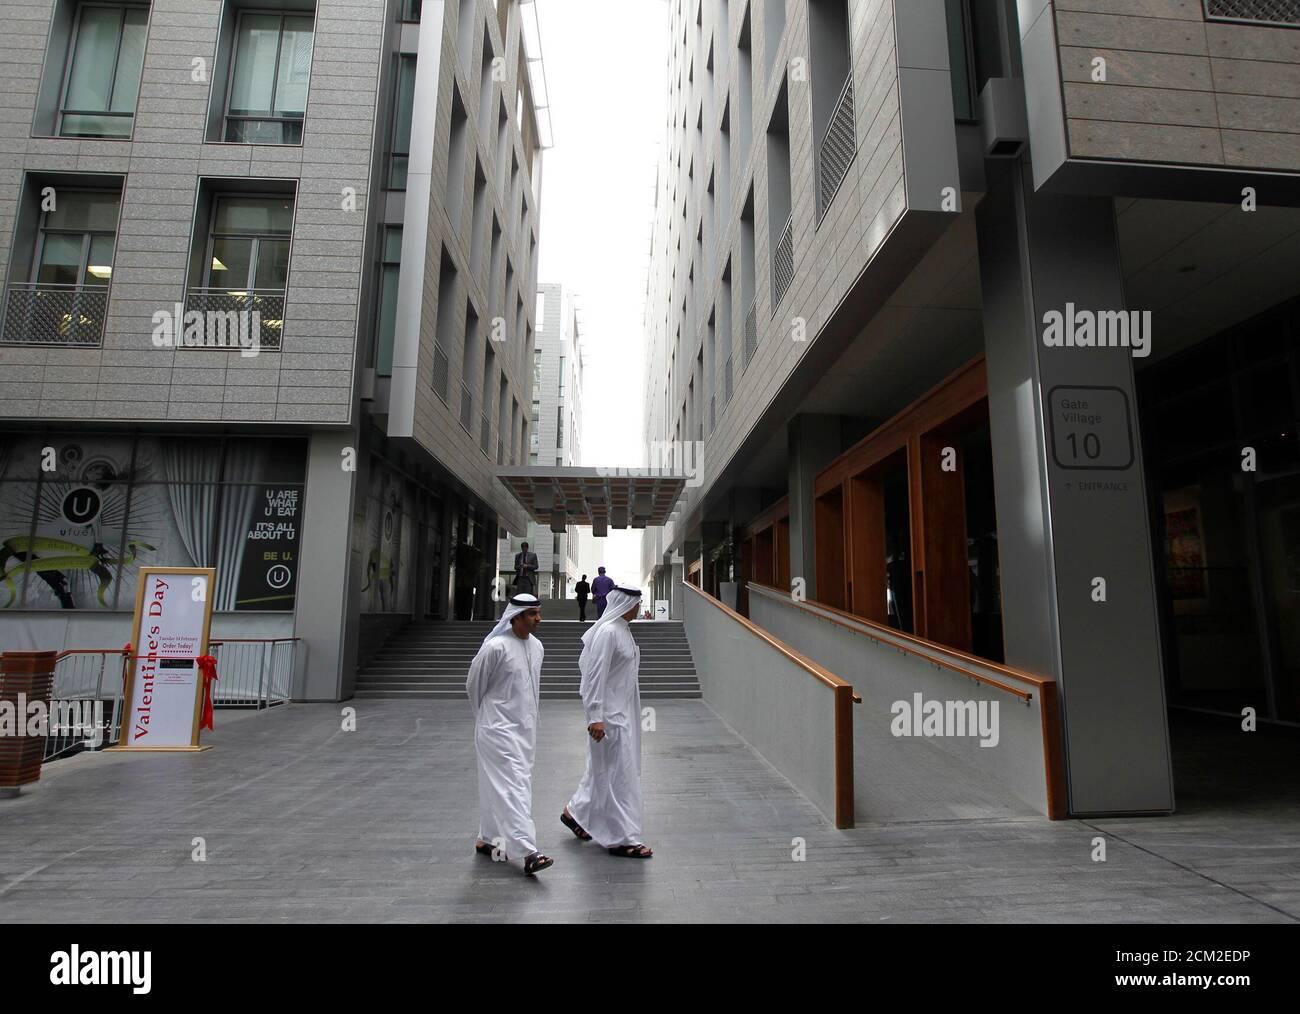 People walk in the art village at Dubai International Financial Center (DIFC) in Dubai, February 2, 2012. REUTERS/Jumana El Heloueh (UNITED ARAB EMIRATES - Tags: BUSINESS) Foto de stock